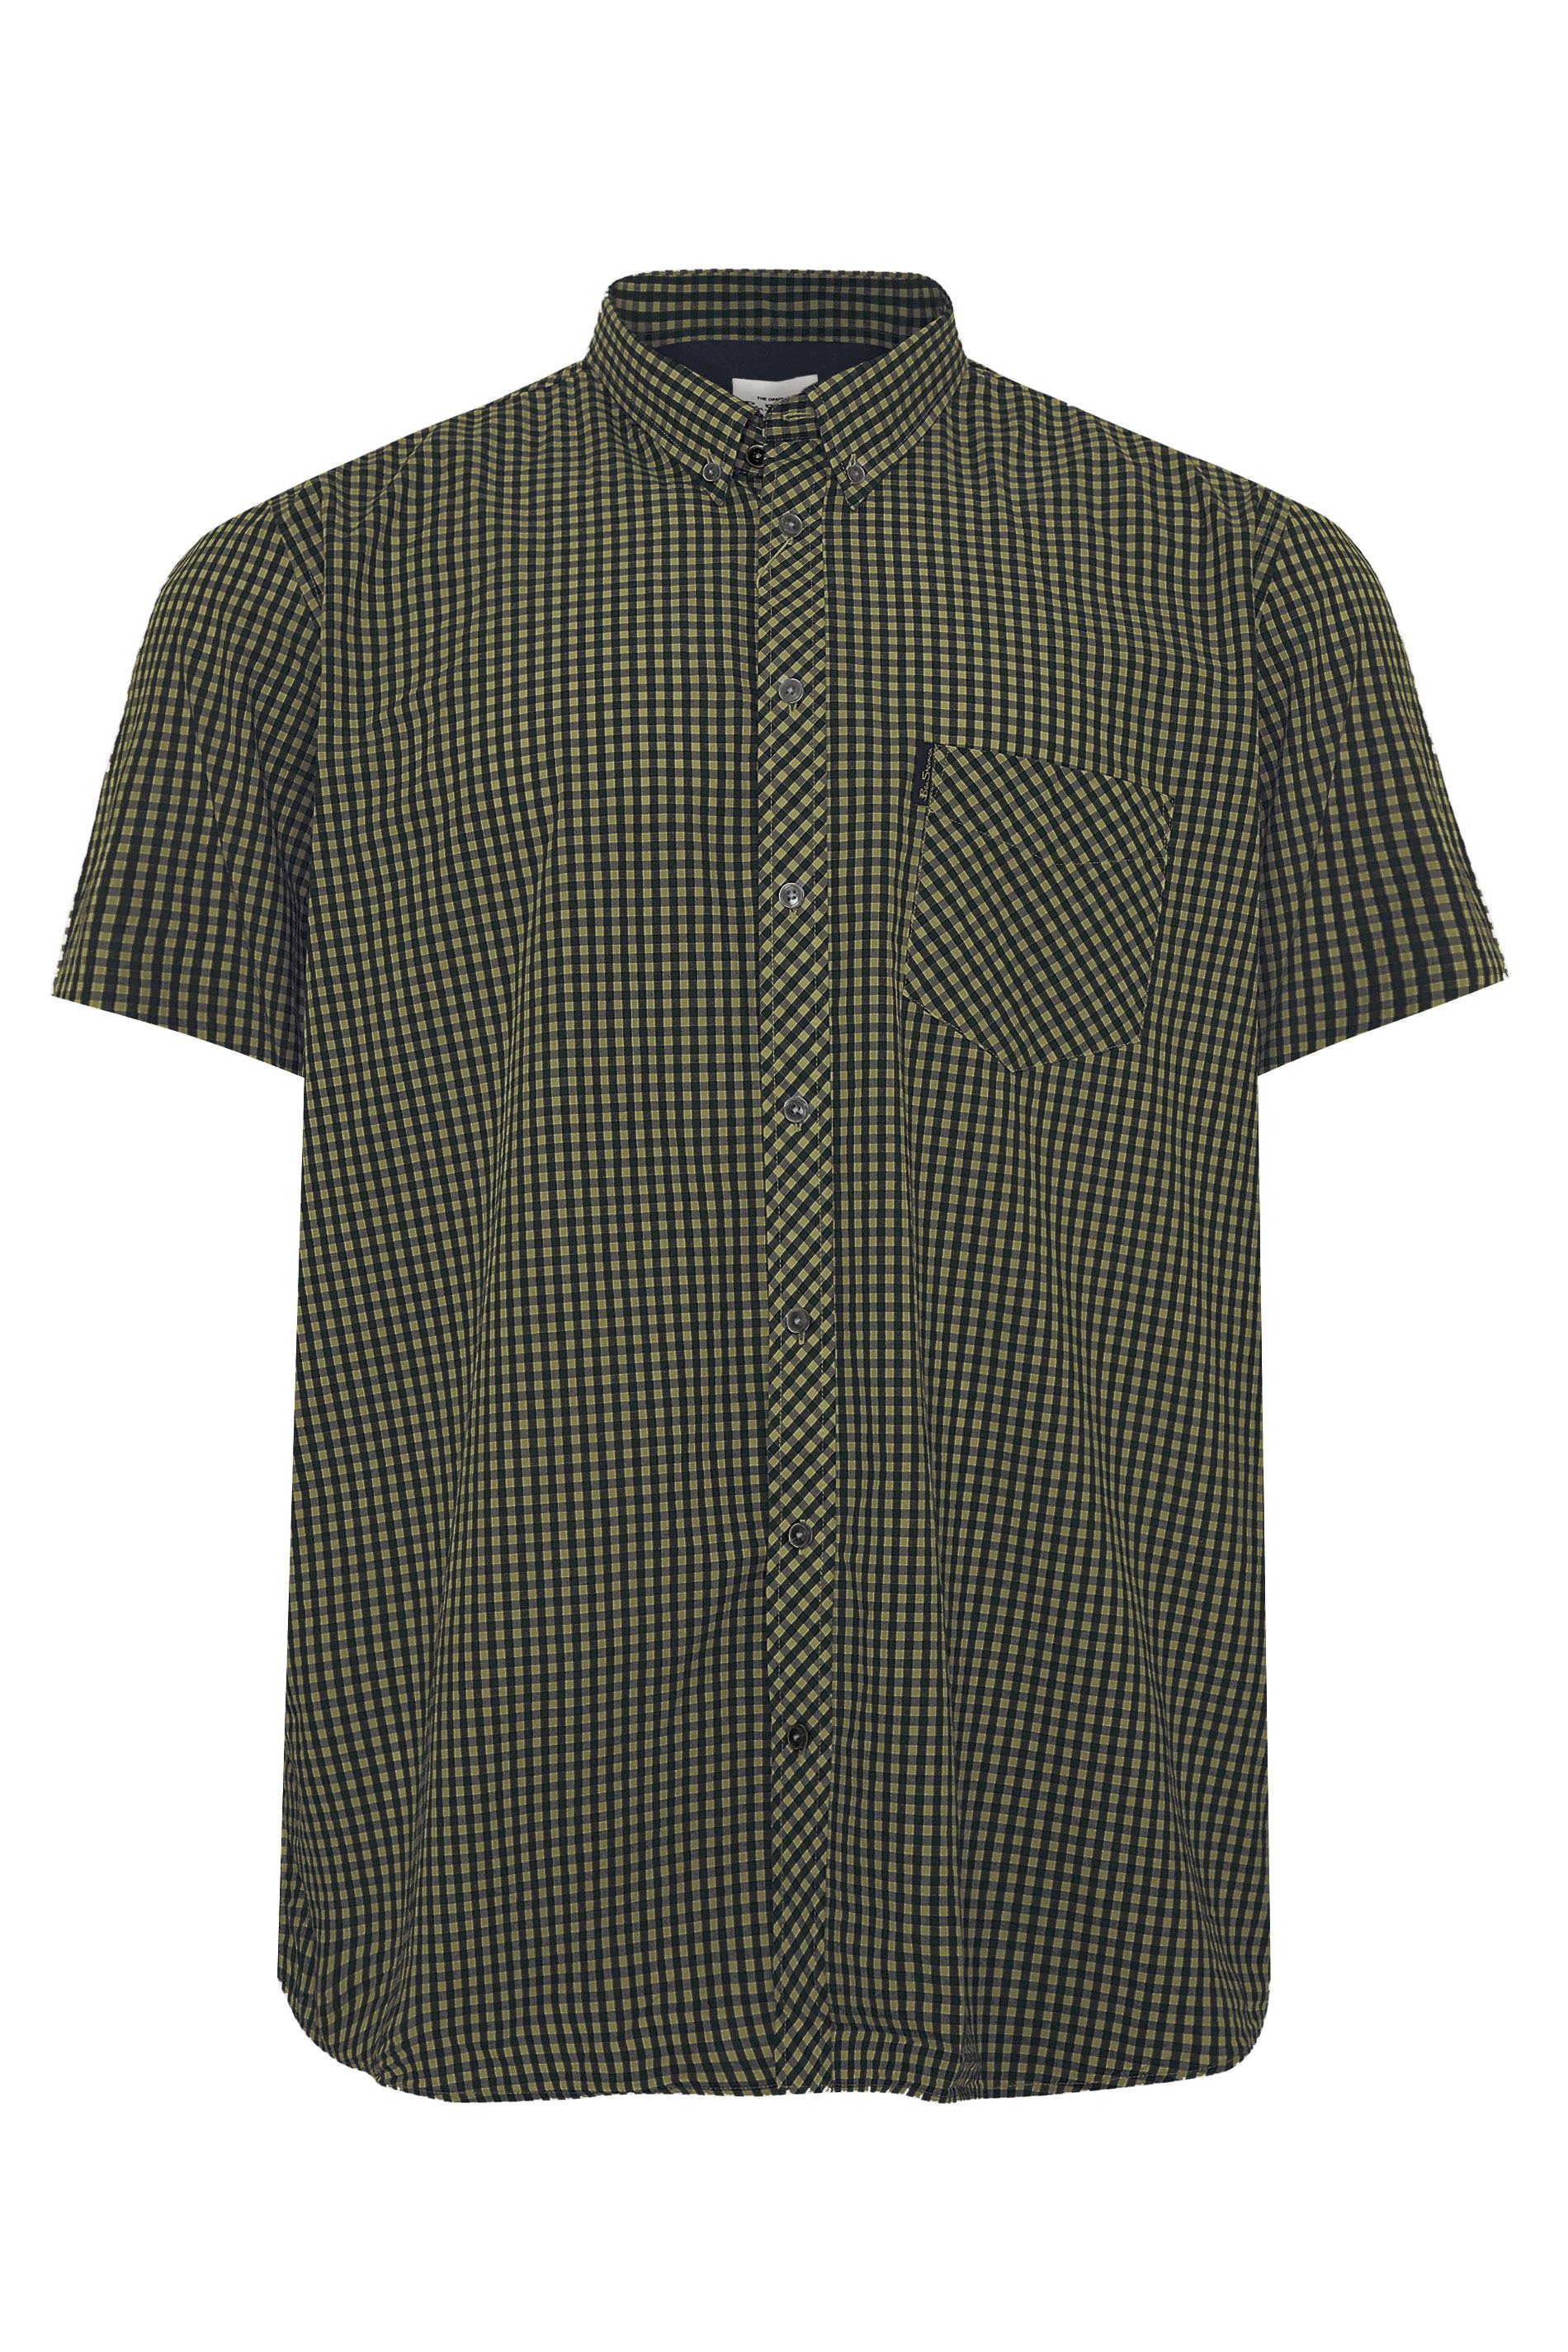 BEN SHERMAN Green Check Signature Short Sleeve Shirt